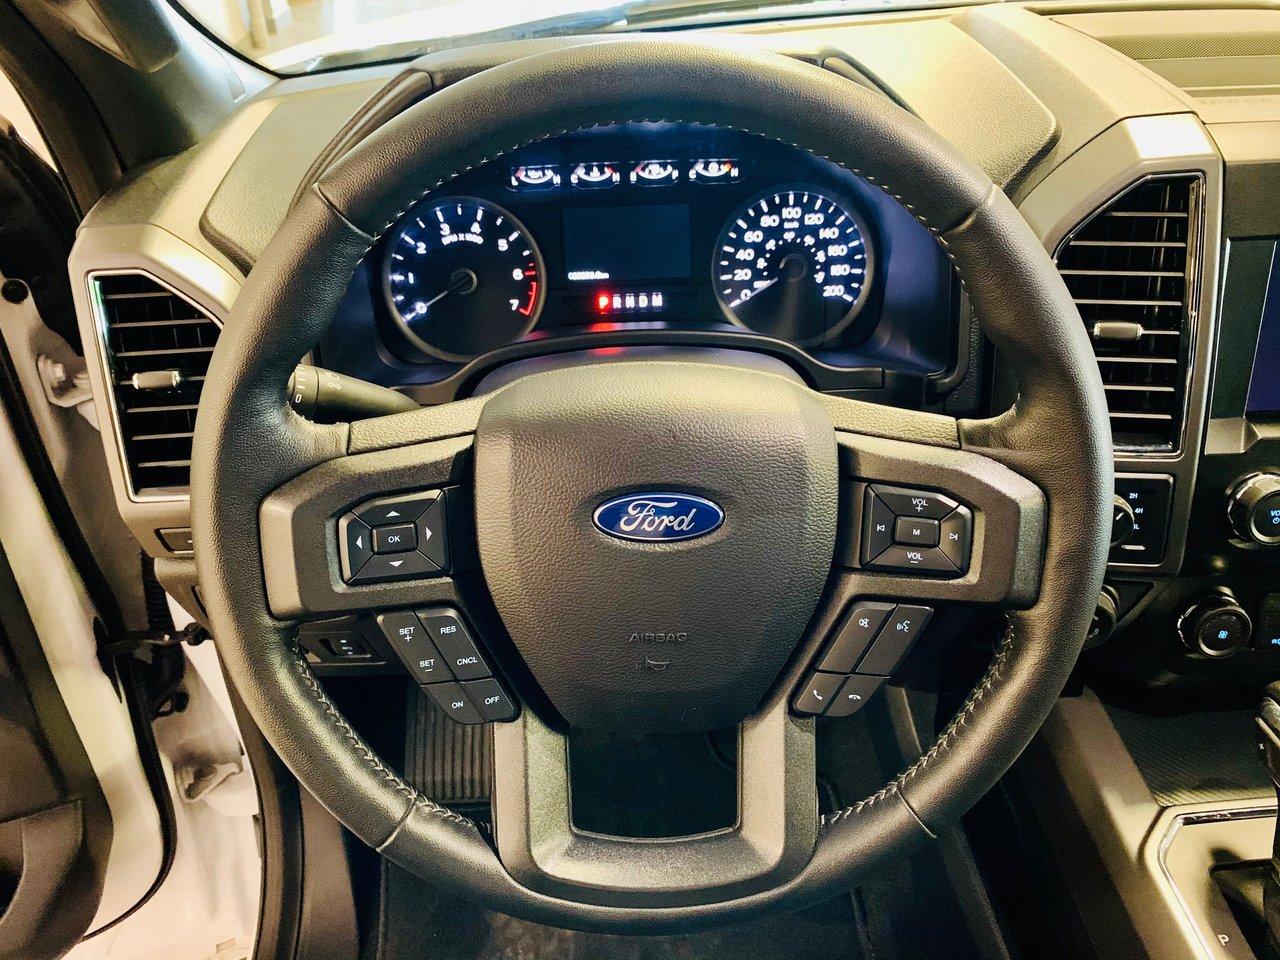 2020 Ford F-150 XLT 4WD 302A SPORT 3.5L ECO / JAMAIS ACCIDENTEE